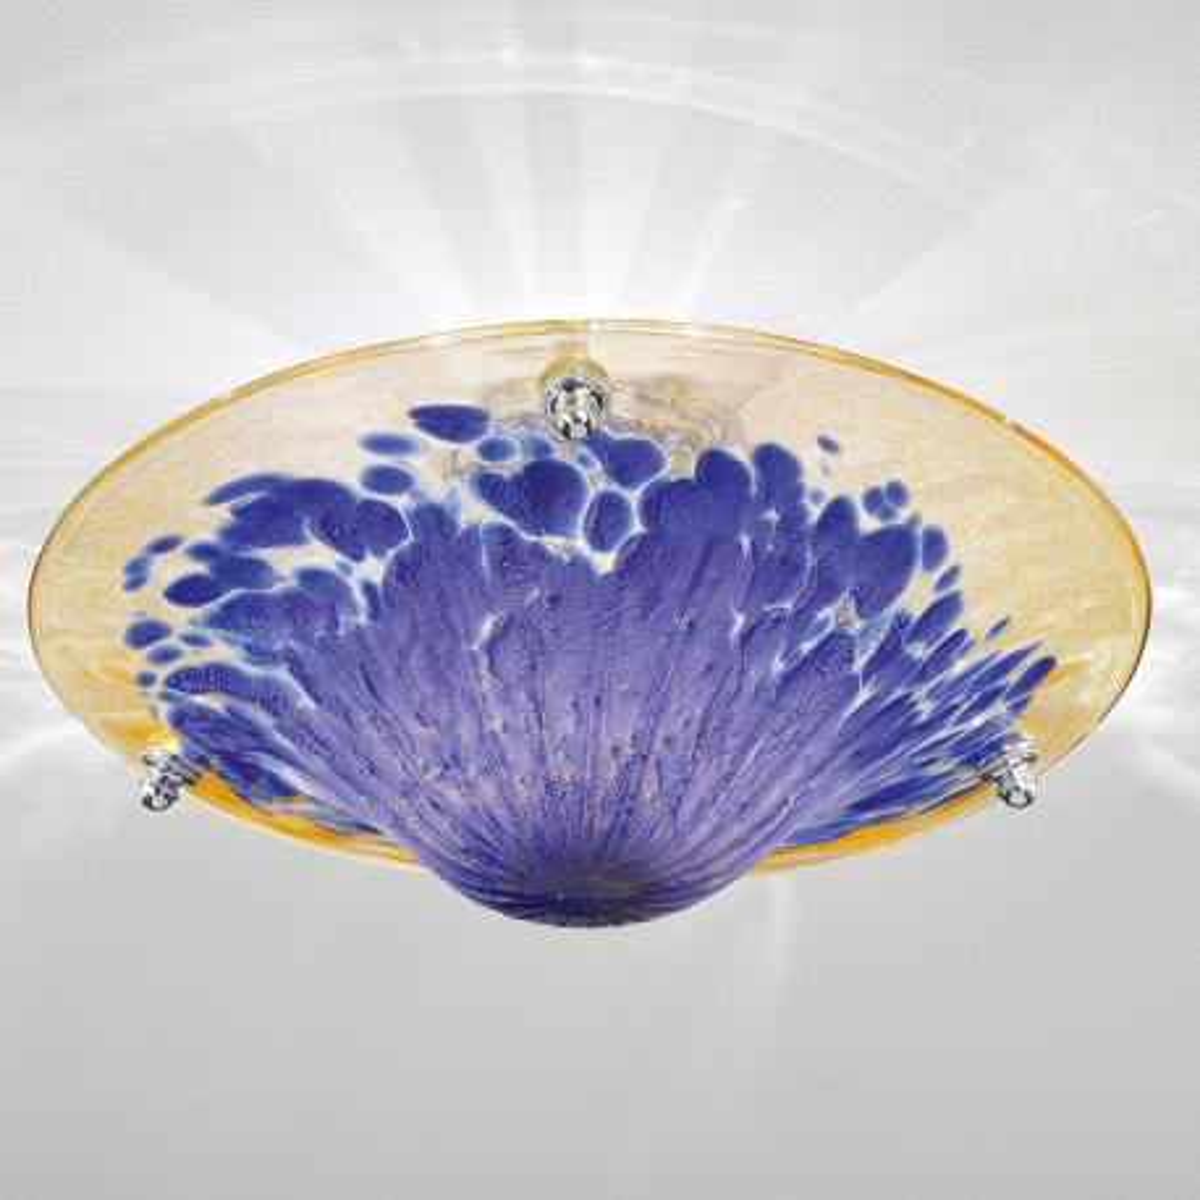 """Frida"" lampara de techo de Murano - 3 luces - ámbar, azul y oro"